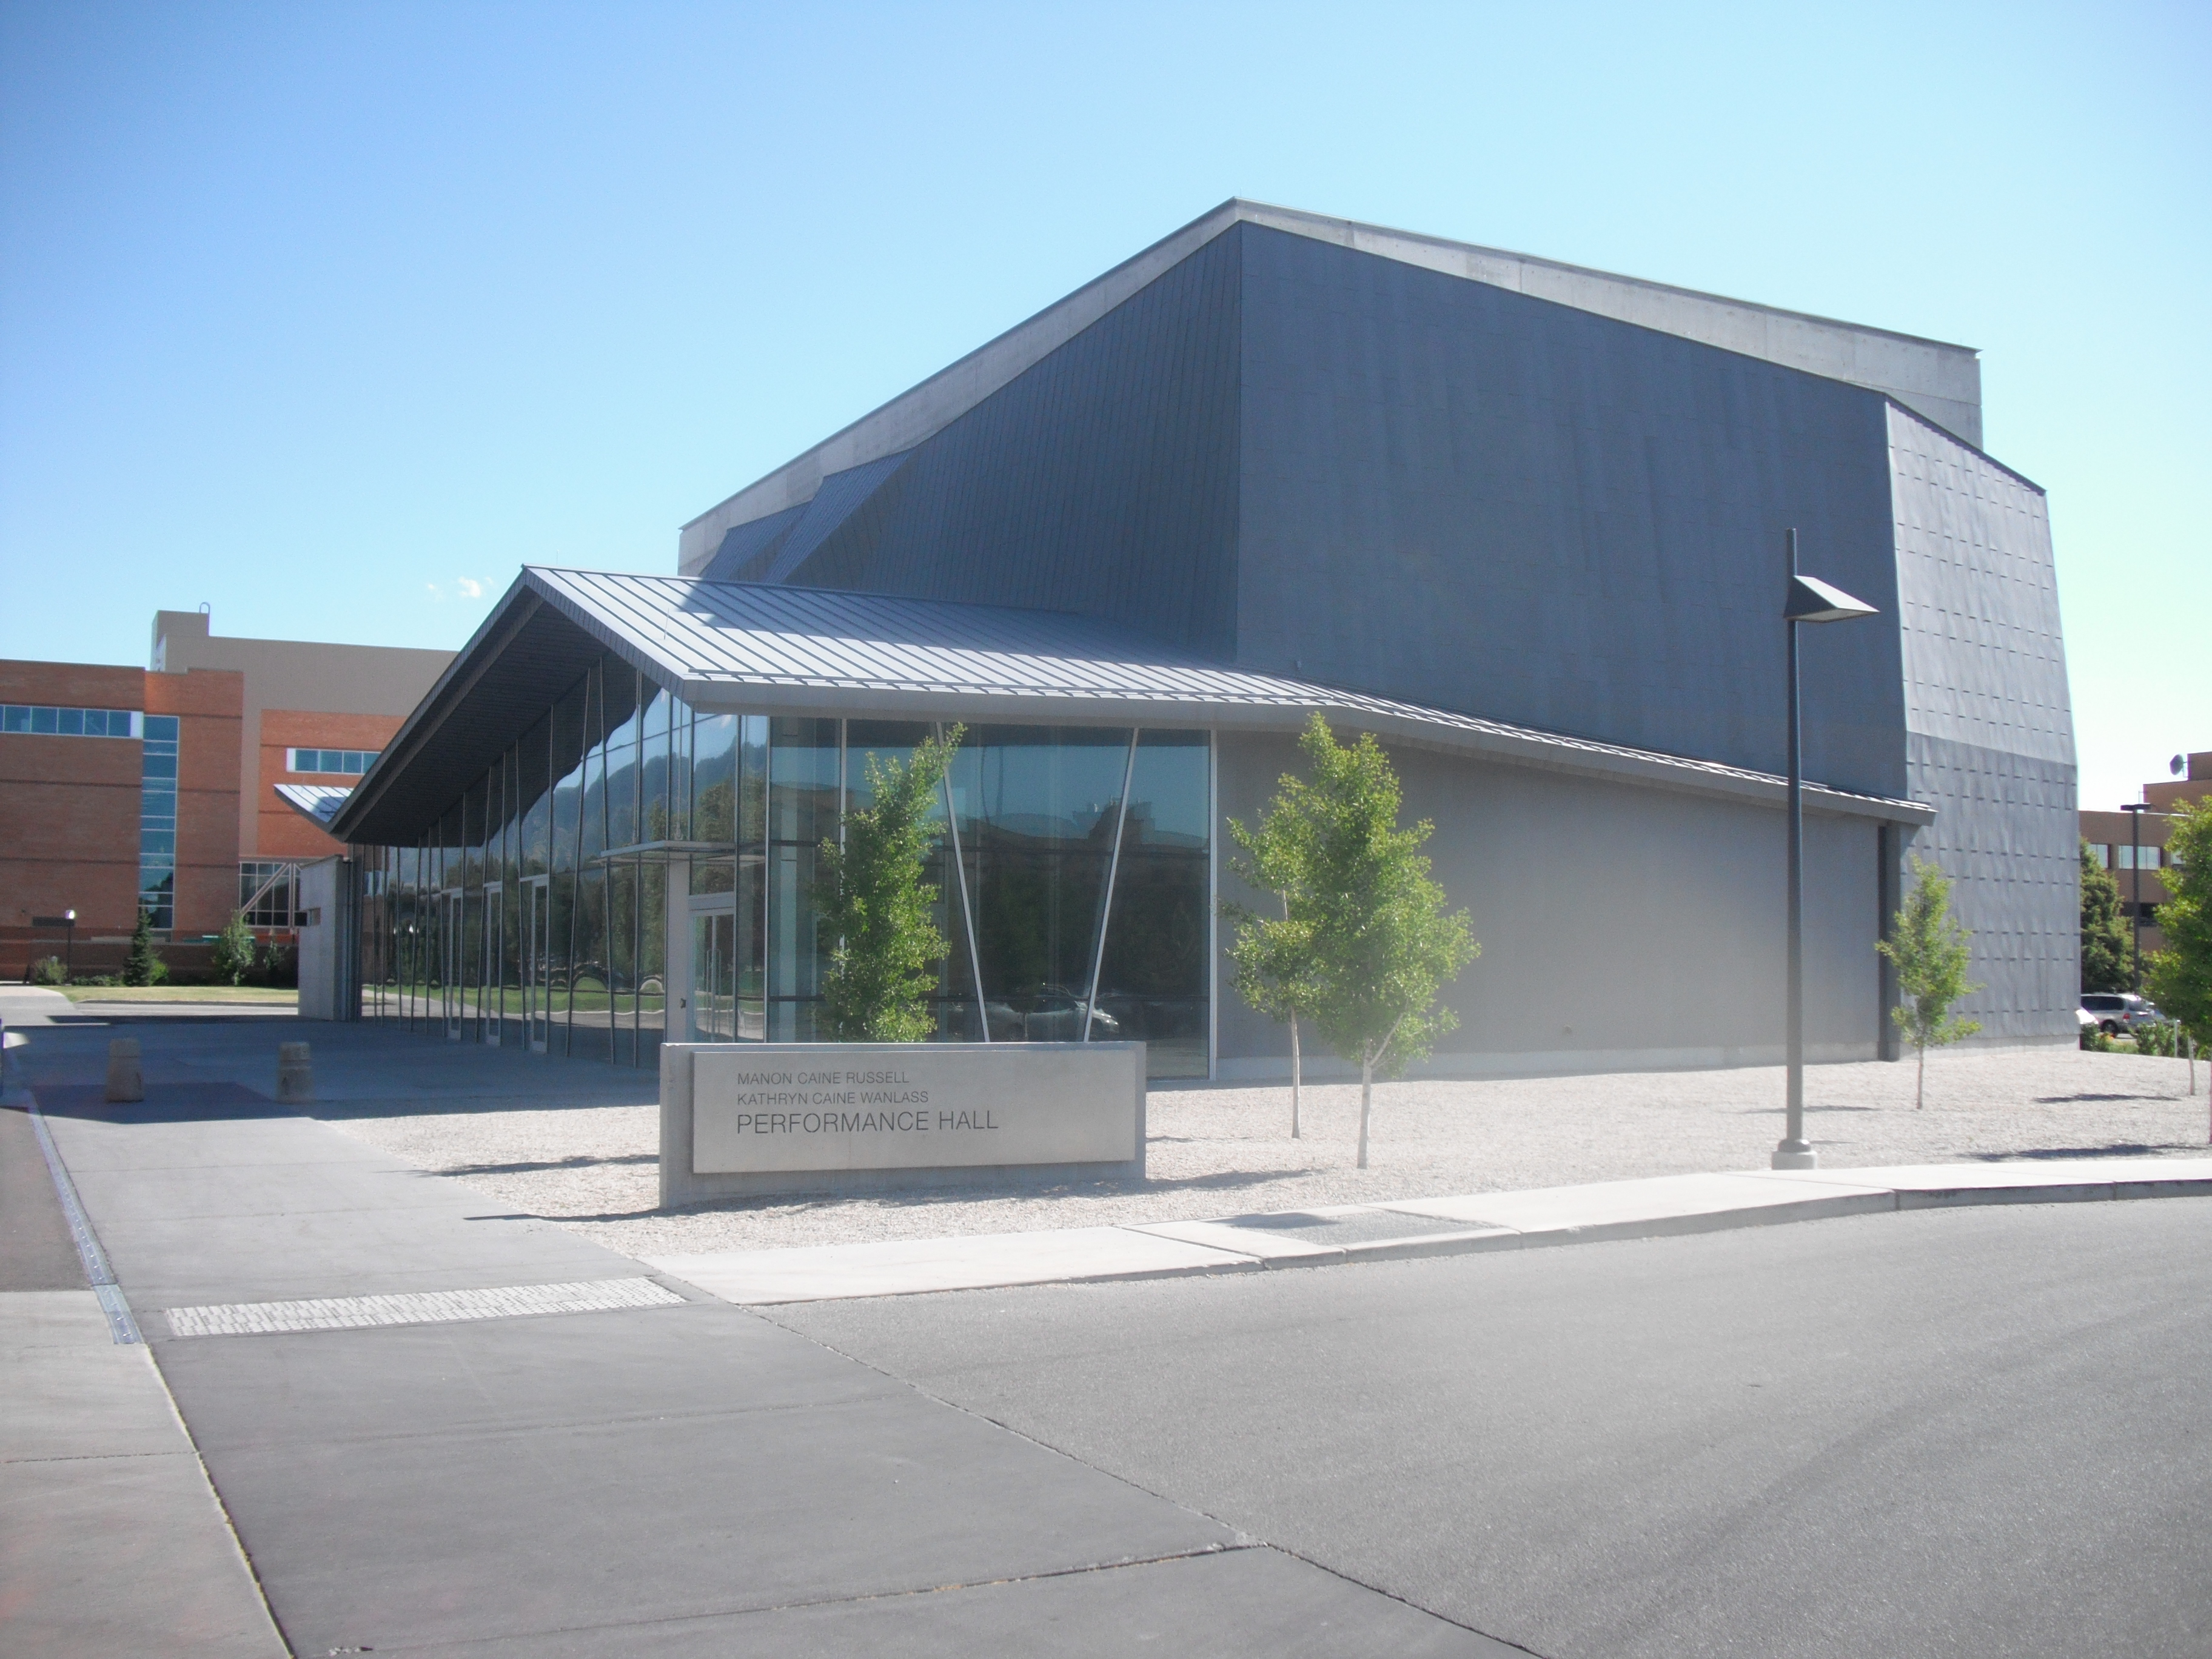 Performance Hall (Utah State University) - Wikipedia